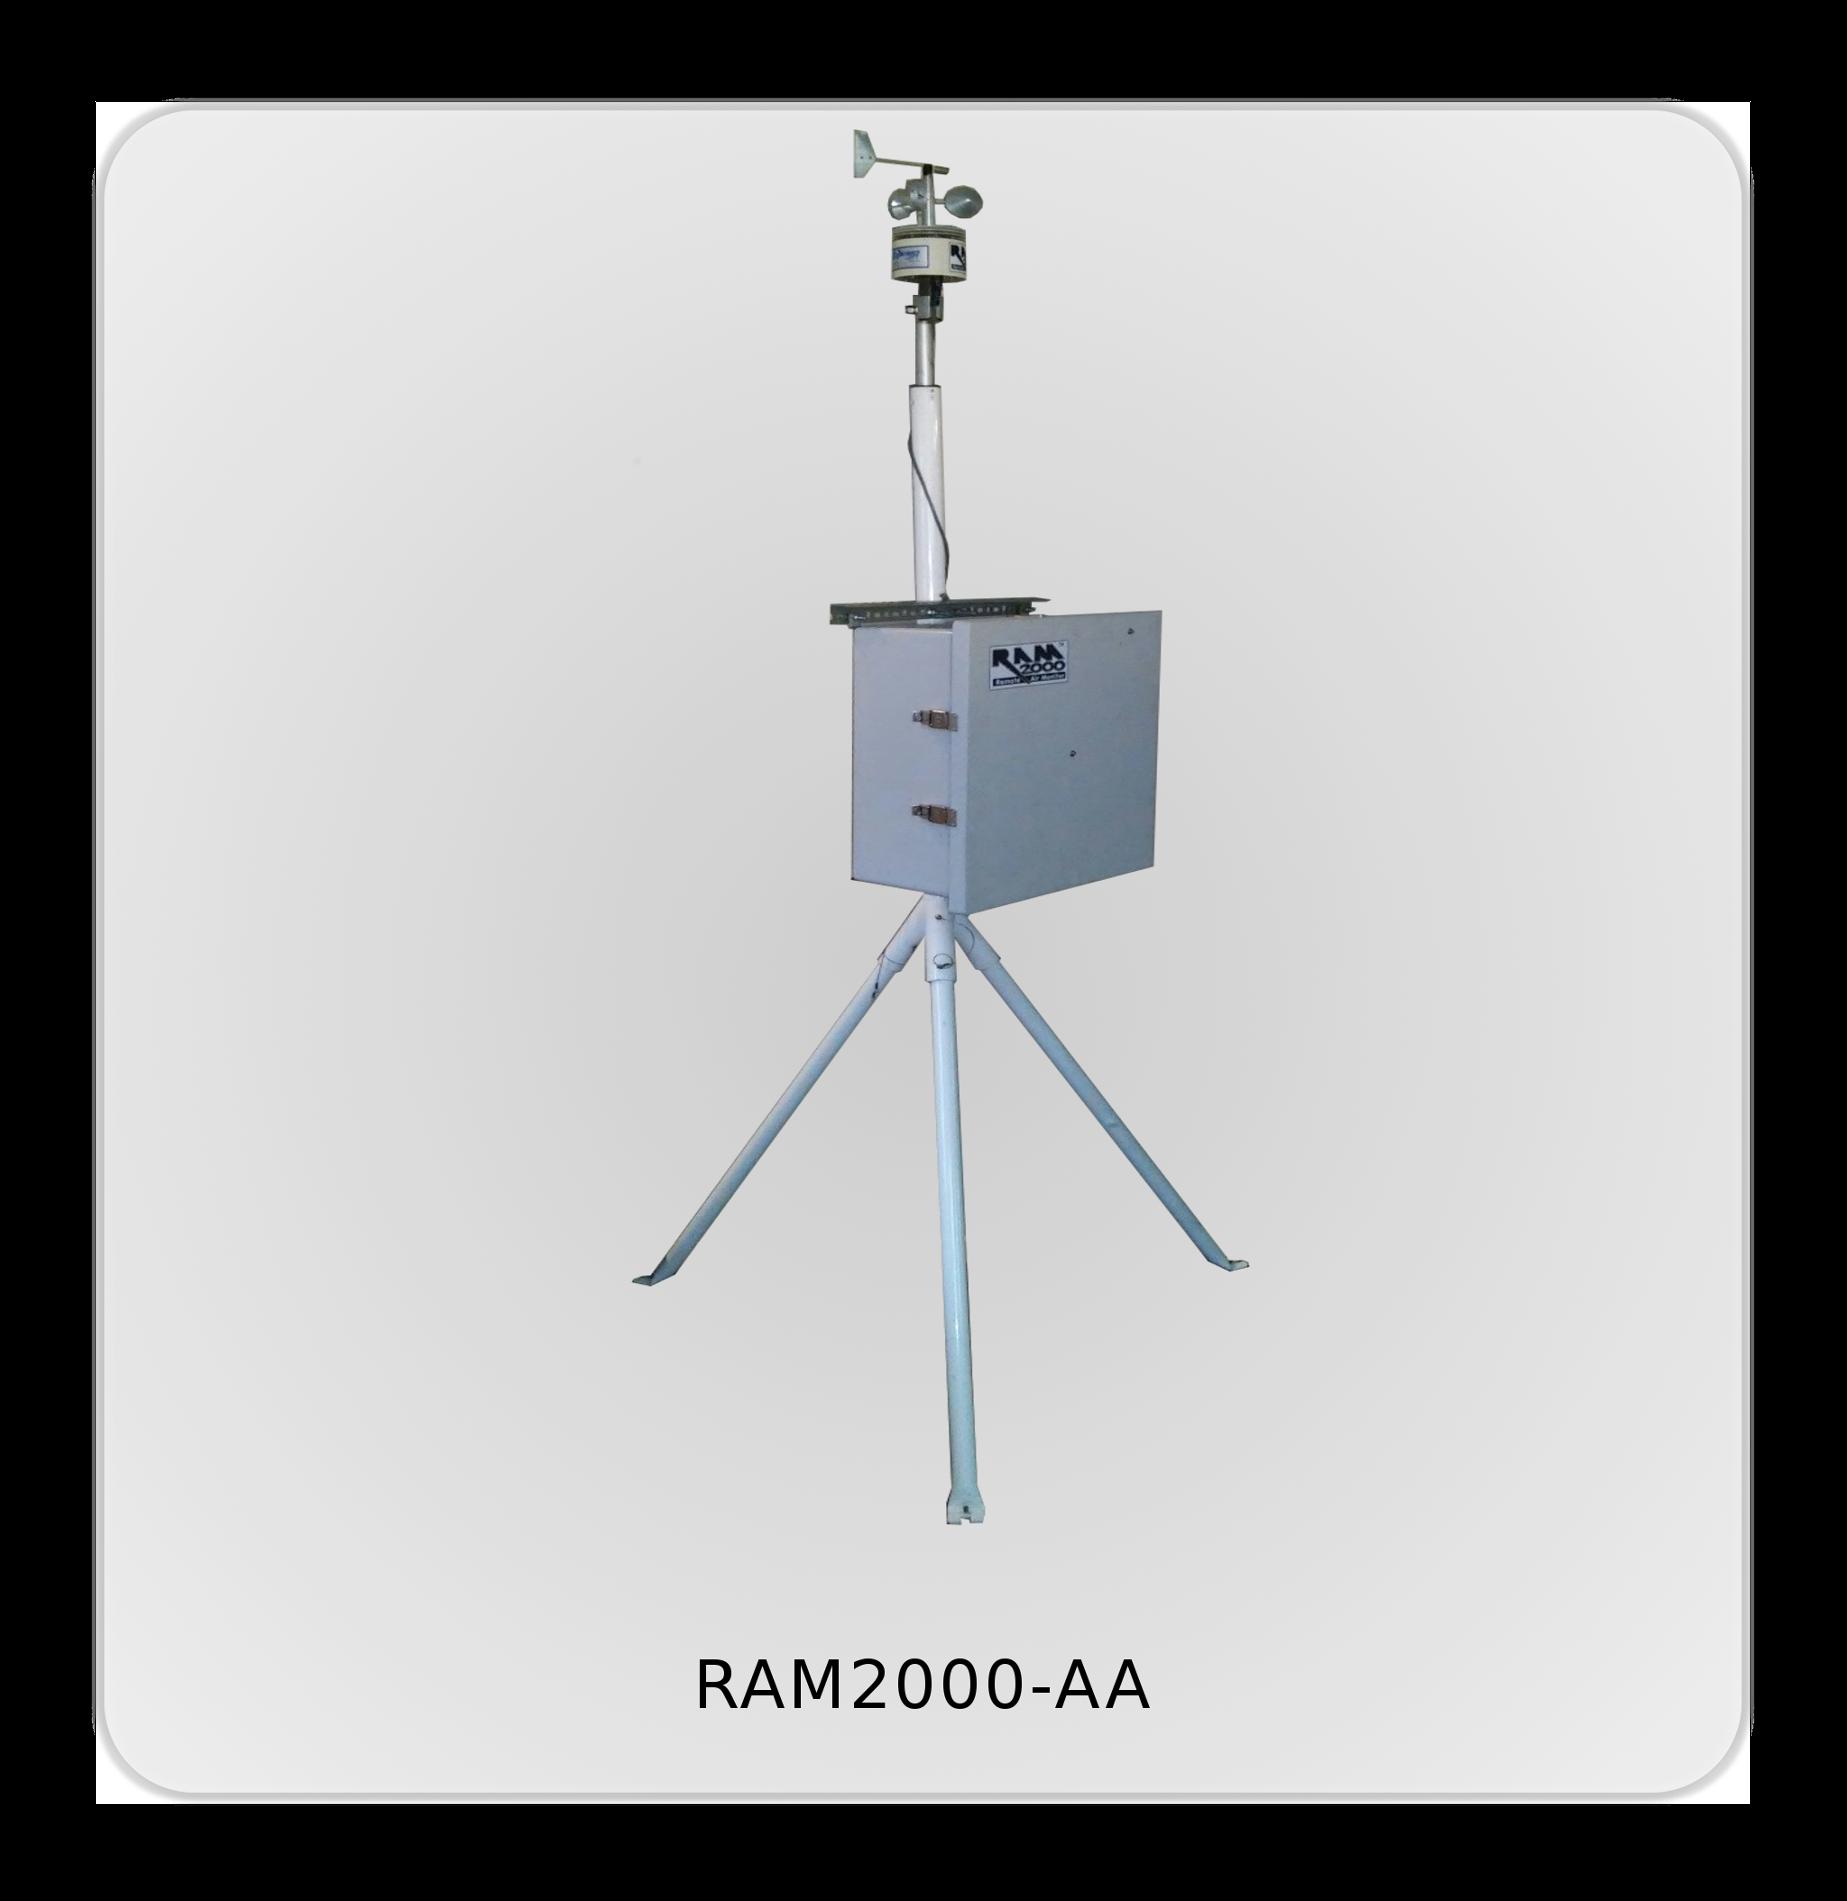 kassay-ram2000-spectrometers-products-ram2000aa